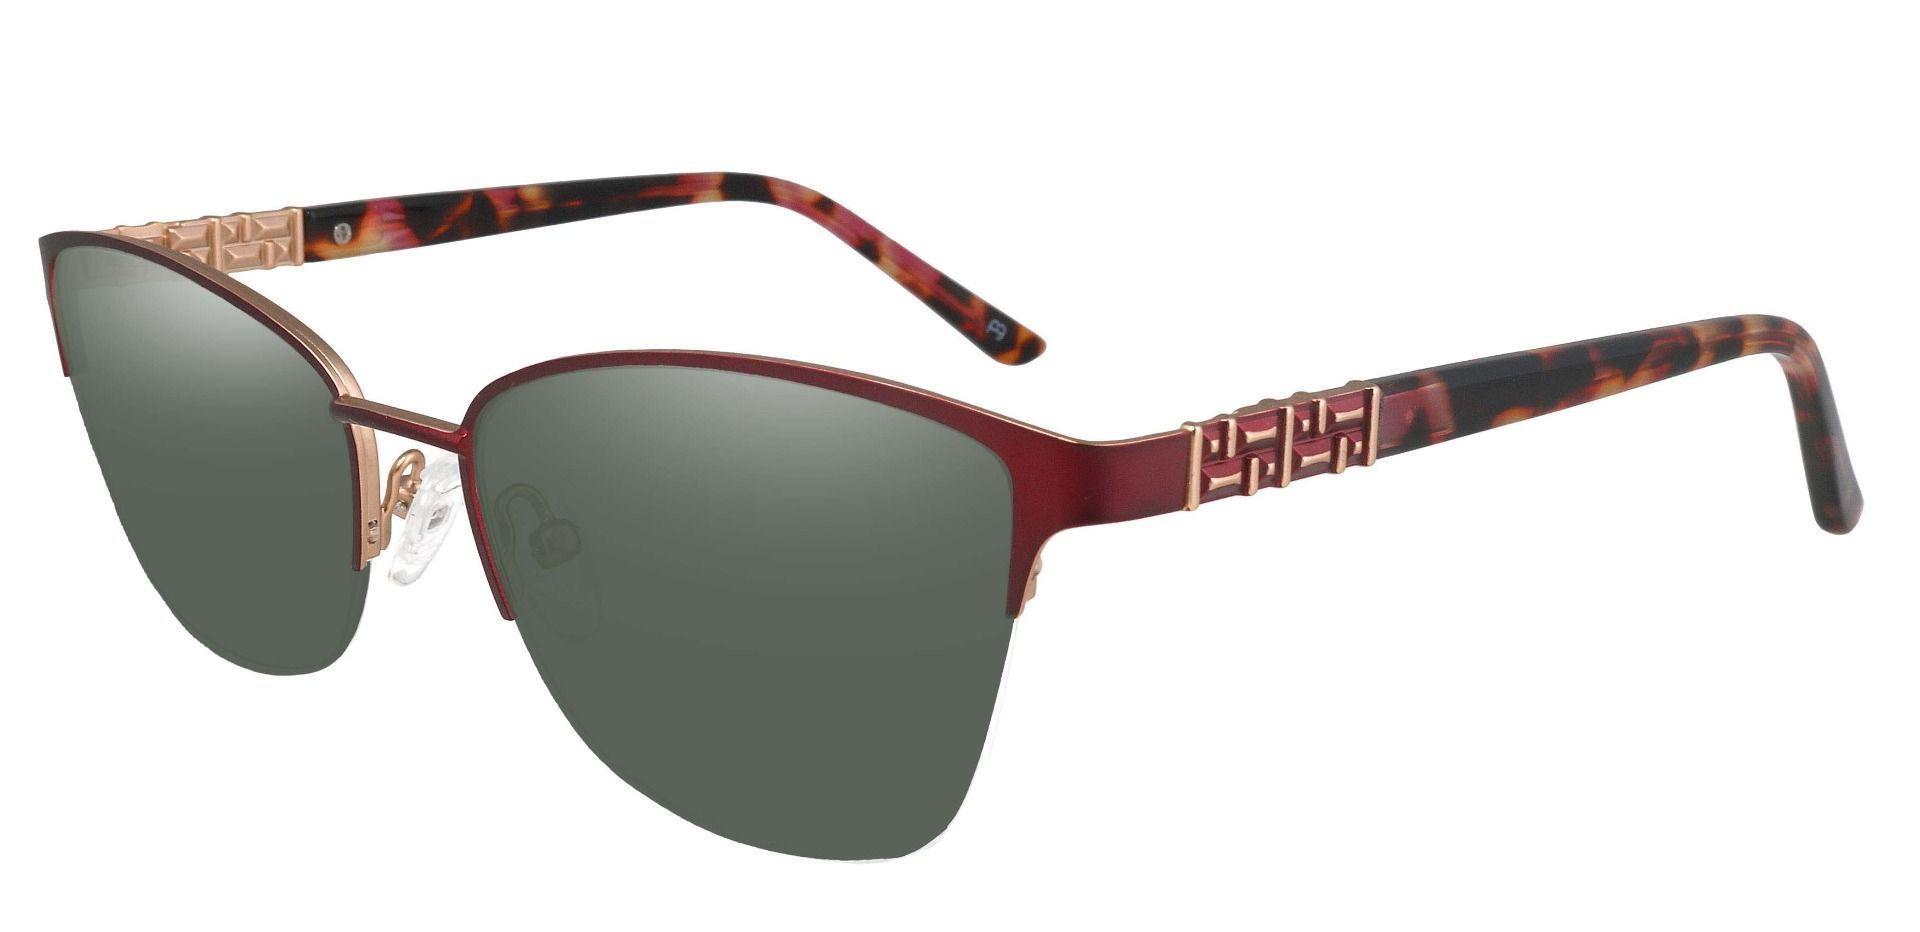 Ballad Cat Eye Prescription Sunglasses - Red Frame With Green Lenses